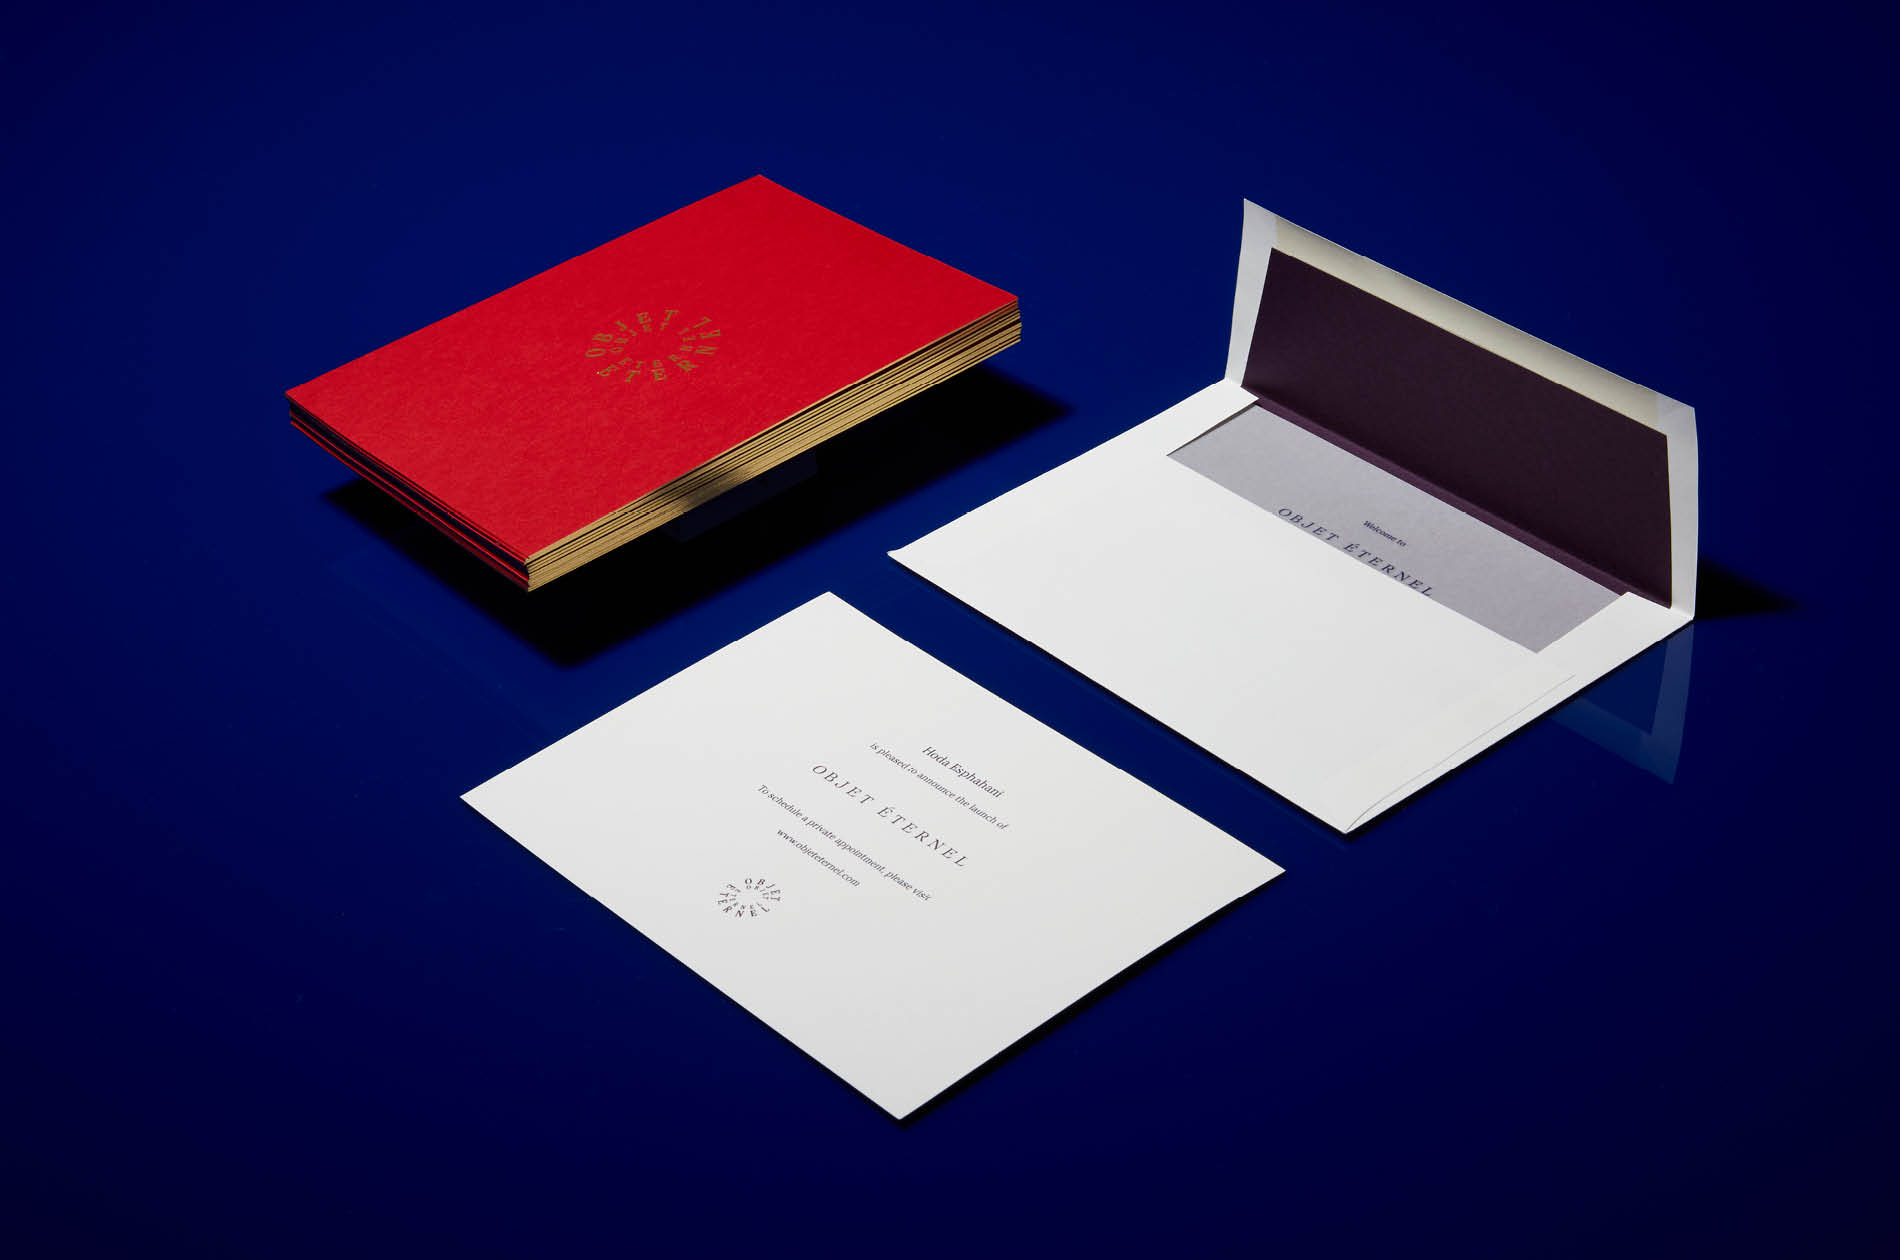 Objet Éternel's elegant announcements designed by DTE